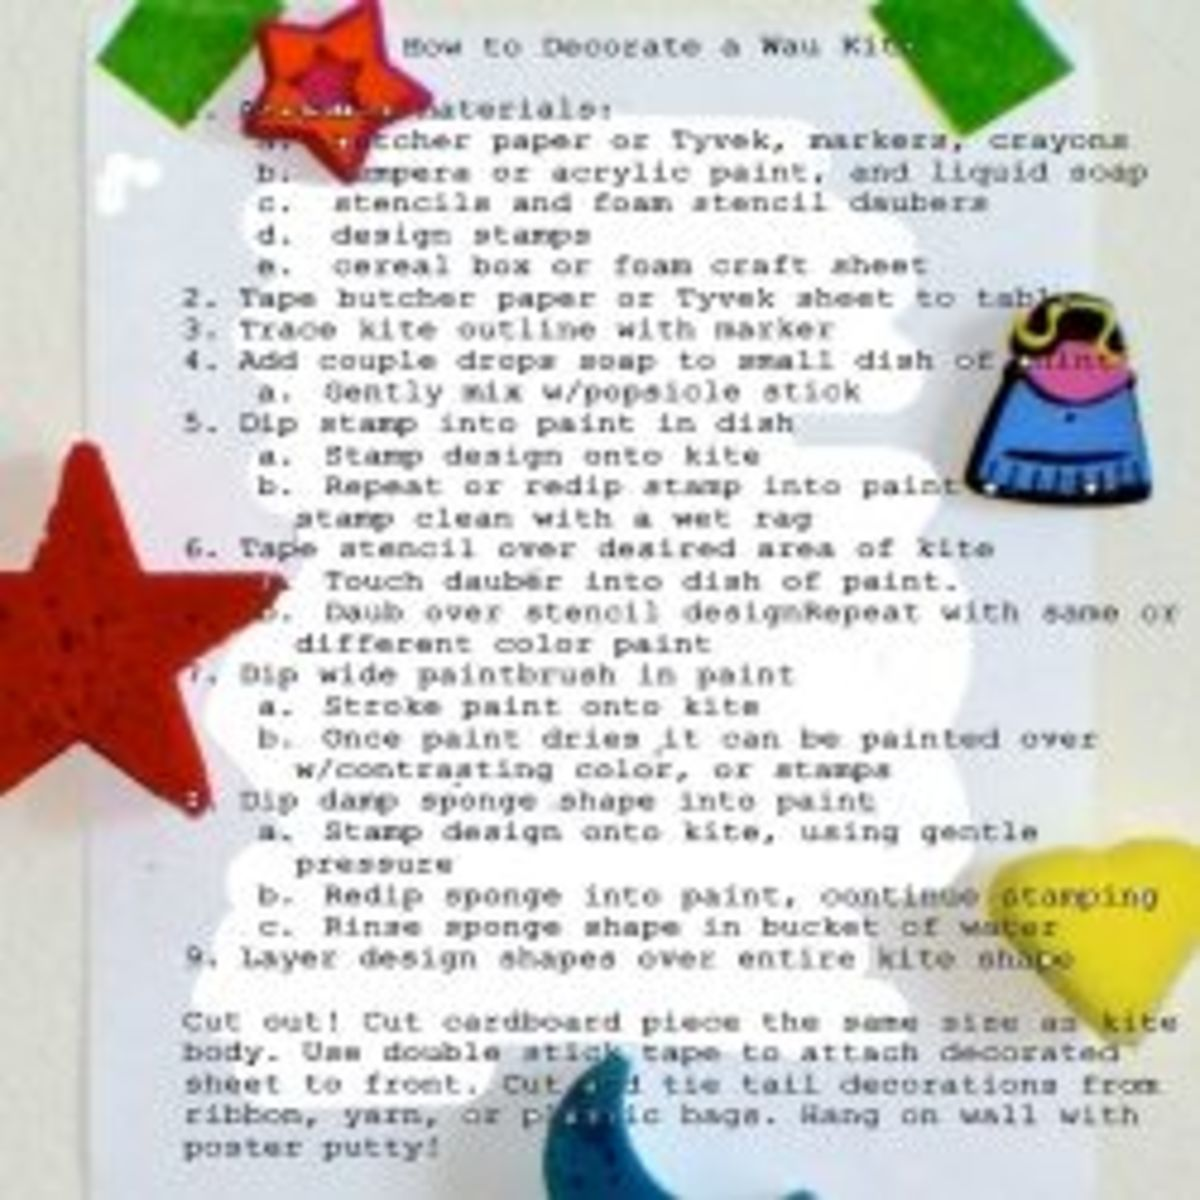 How to Decorate a Wau Kite